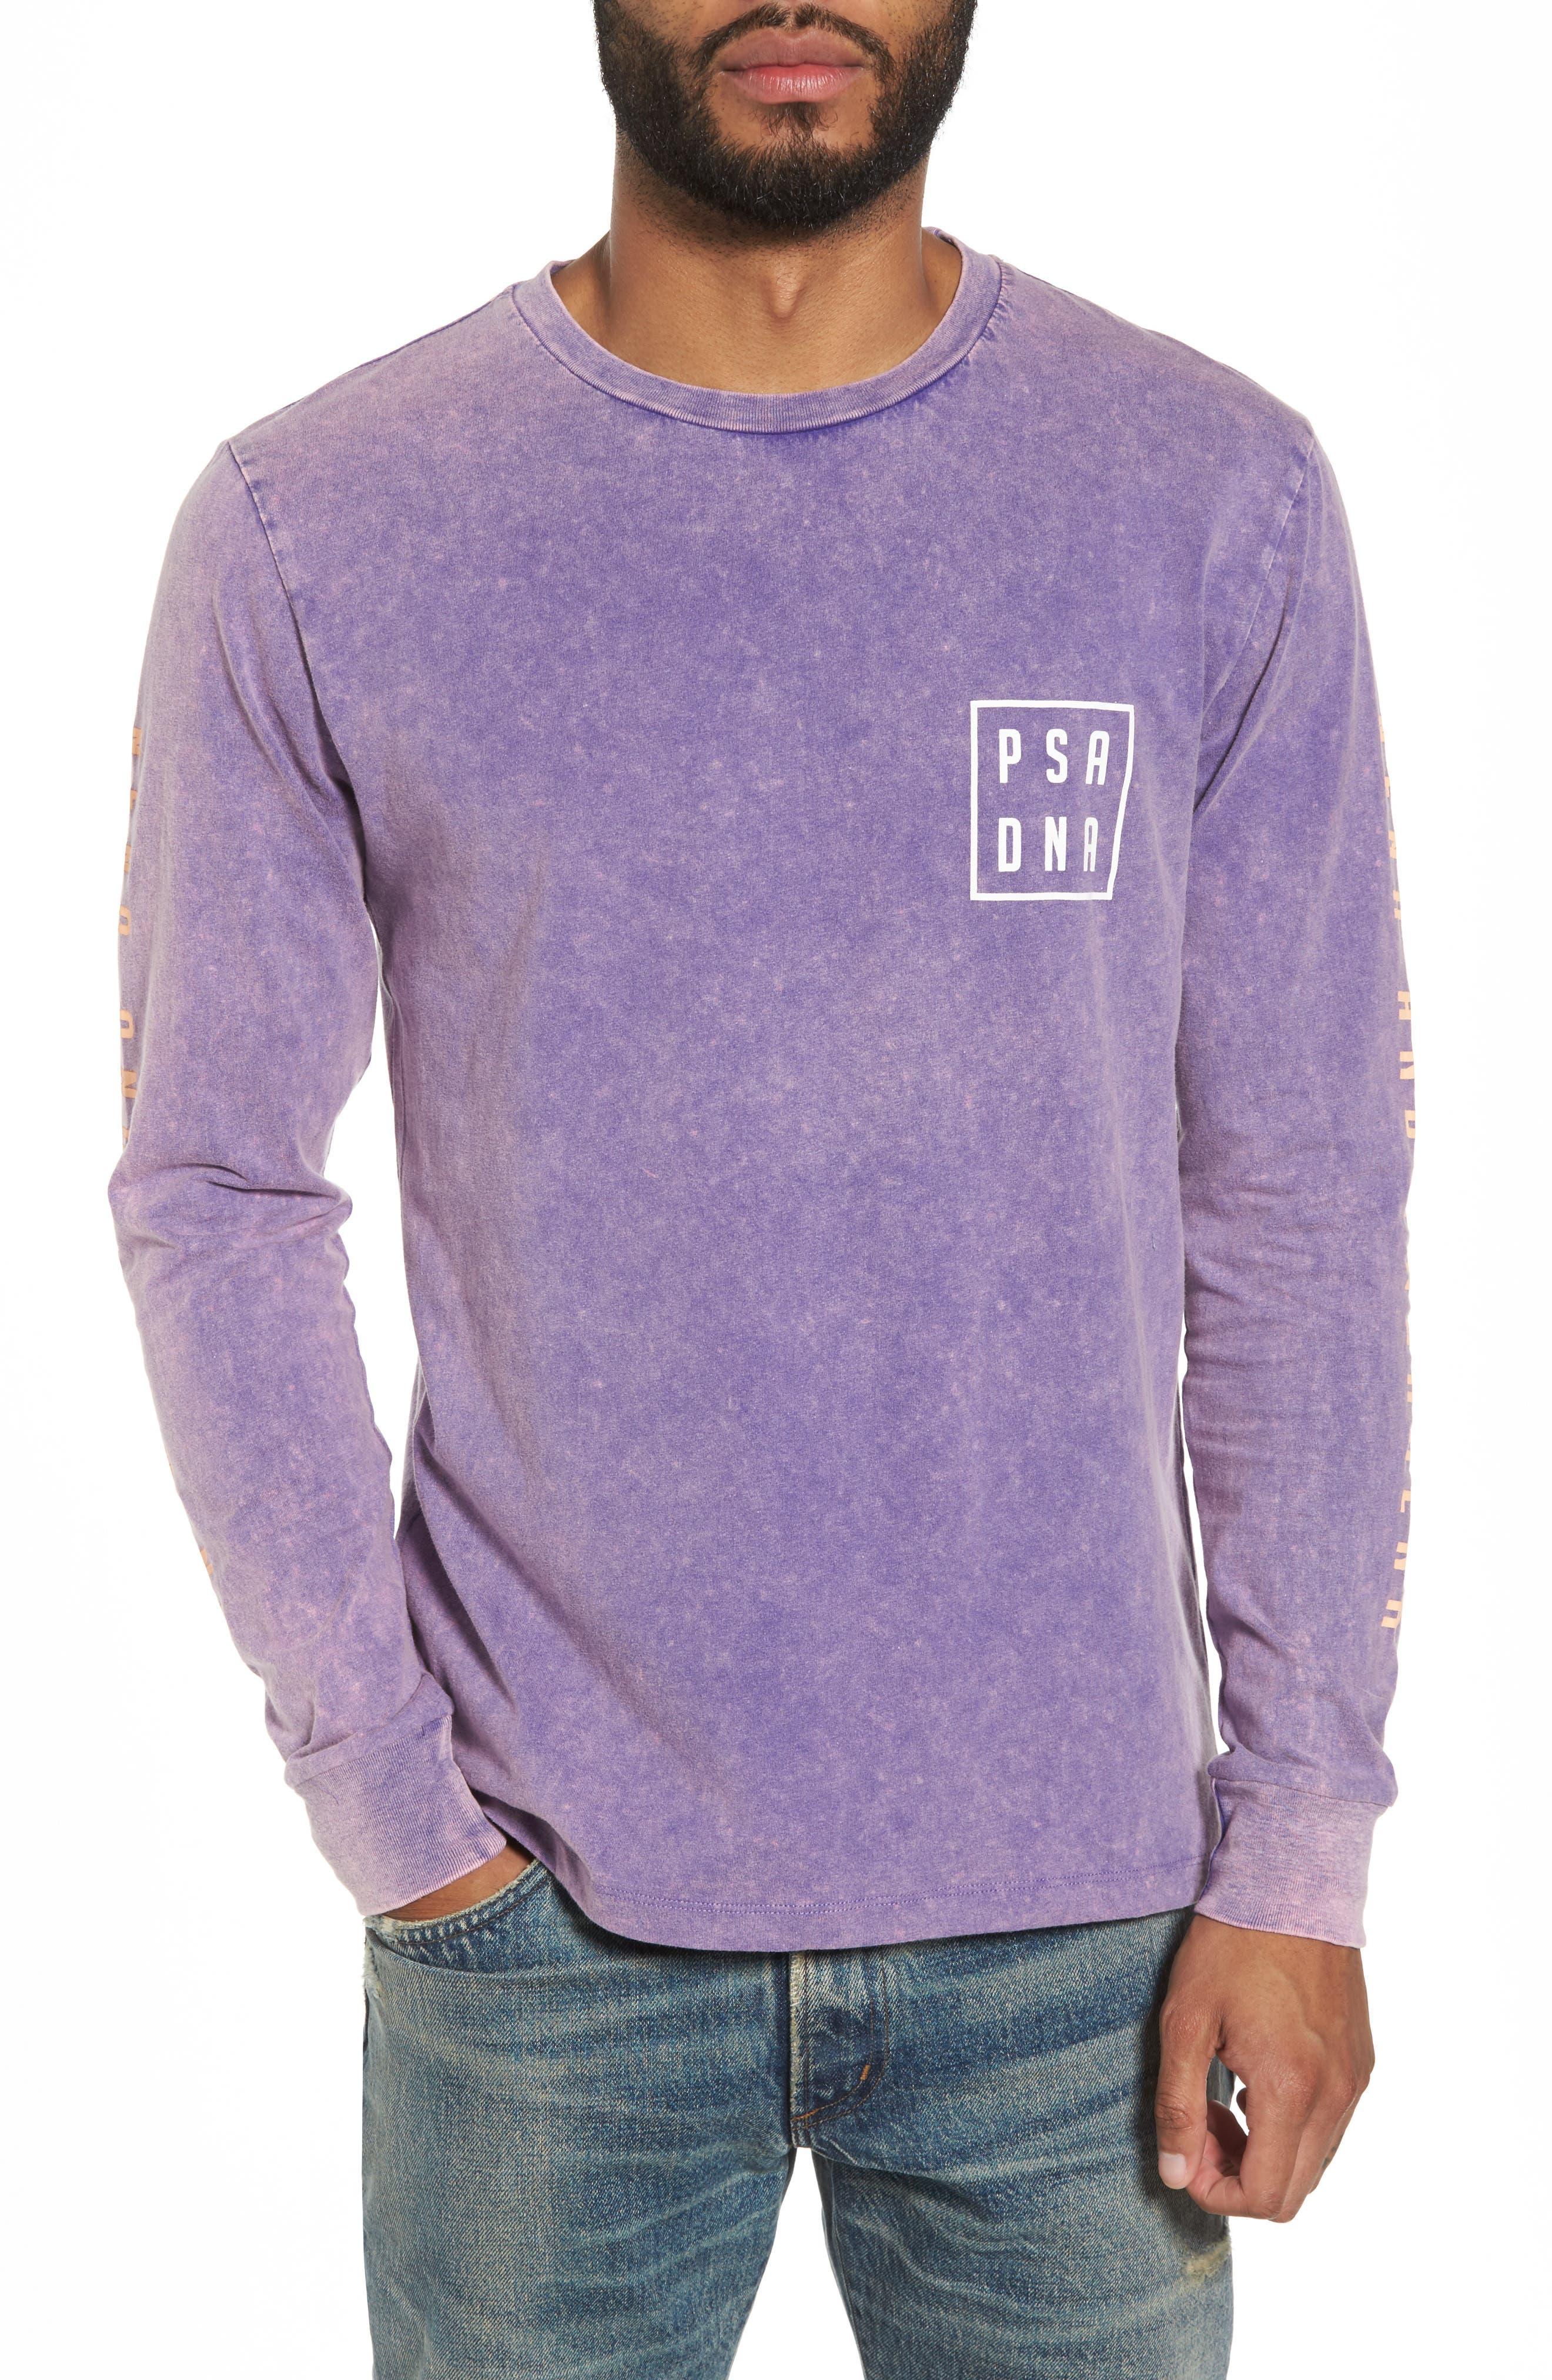 NXP Raiden T-Shirt